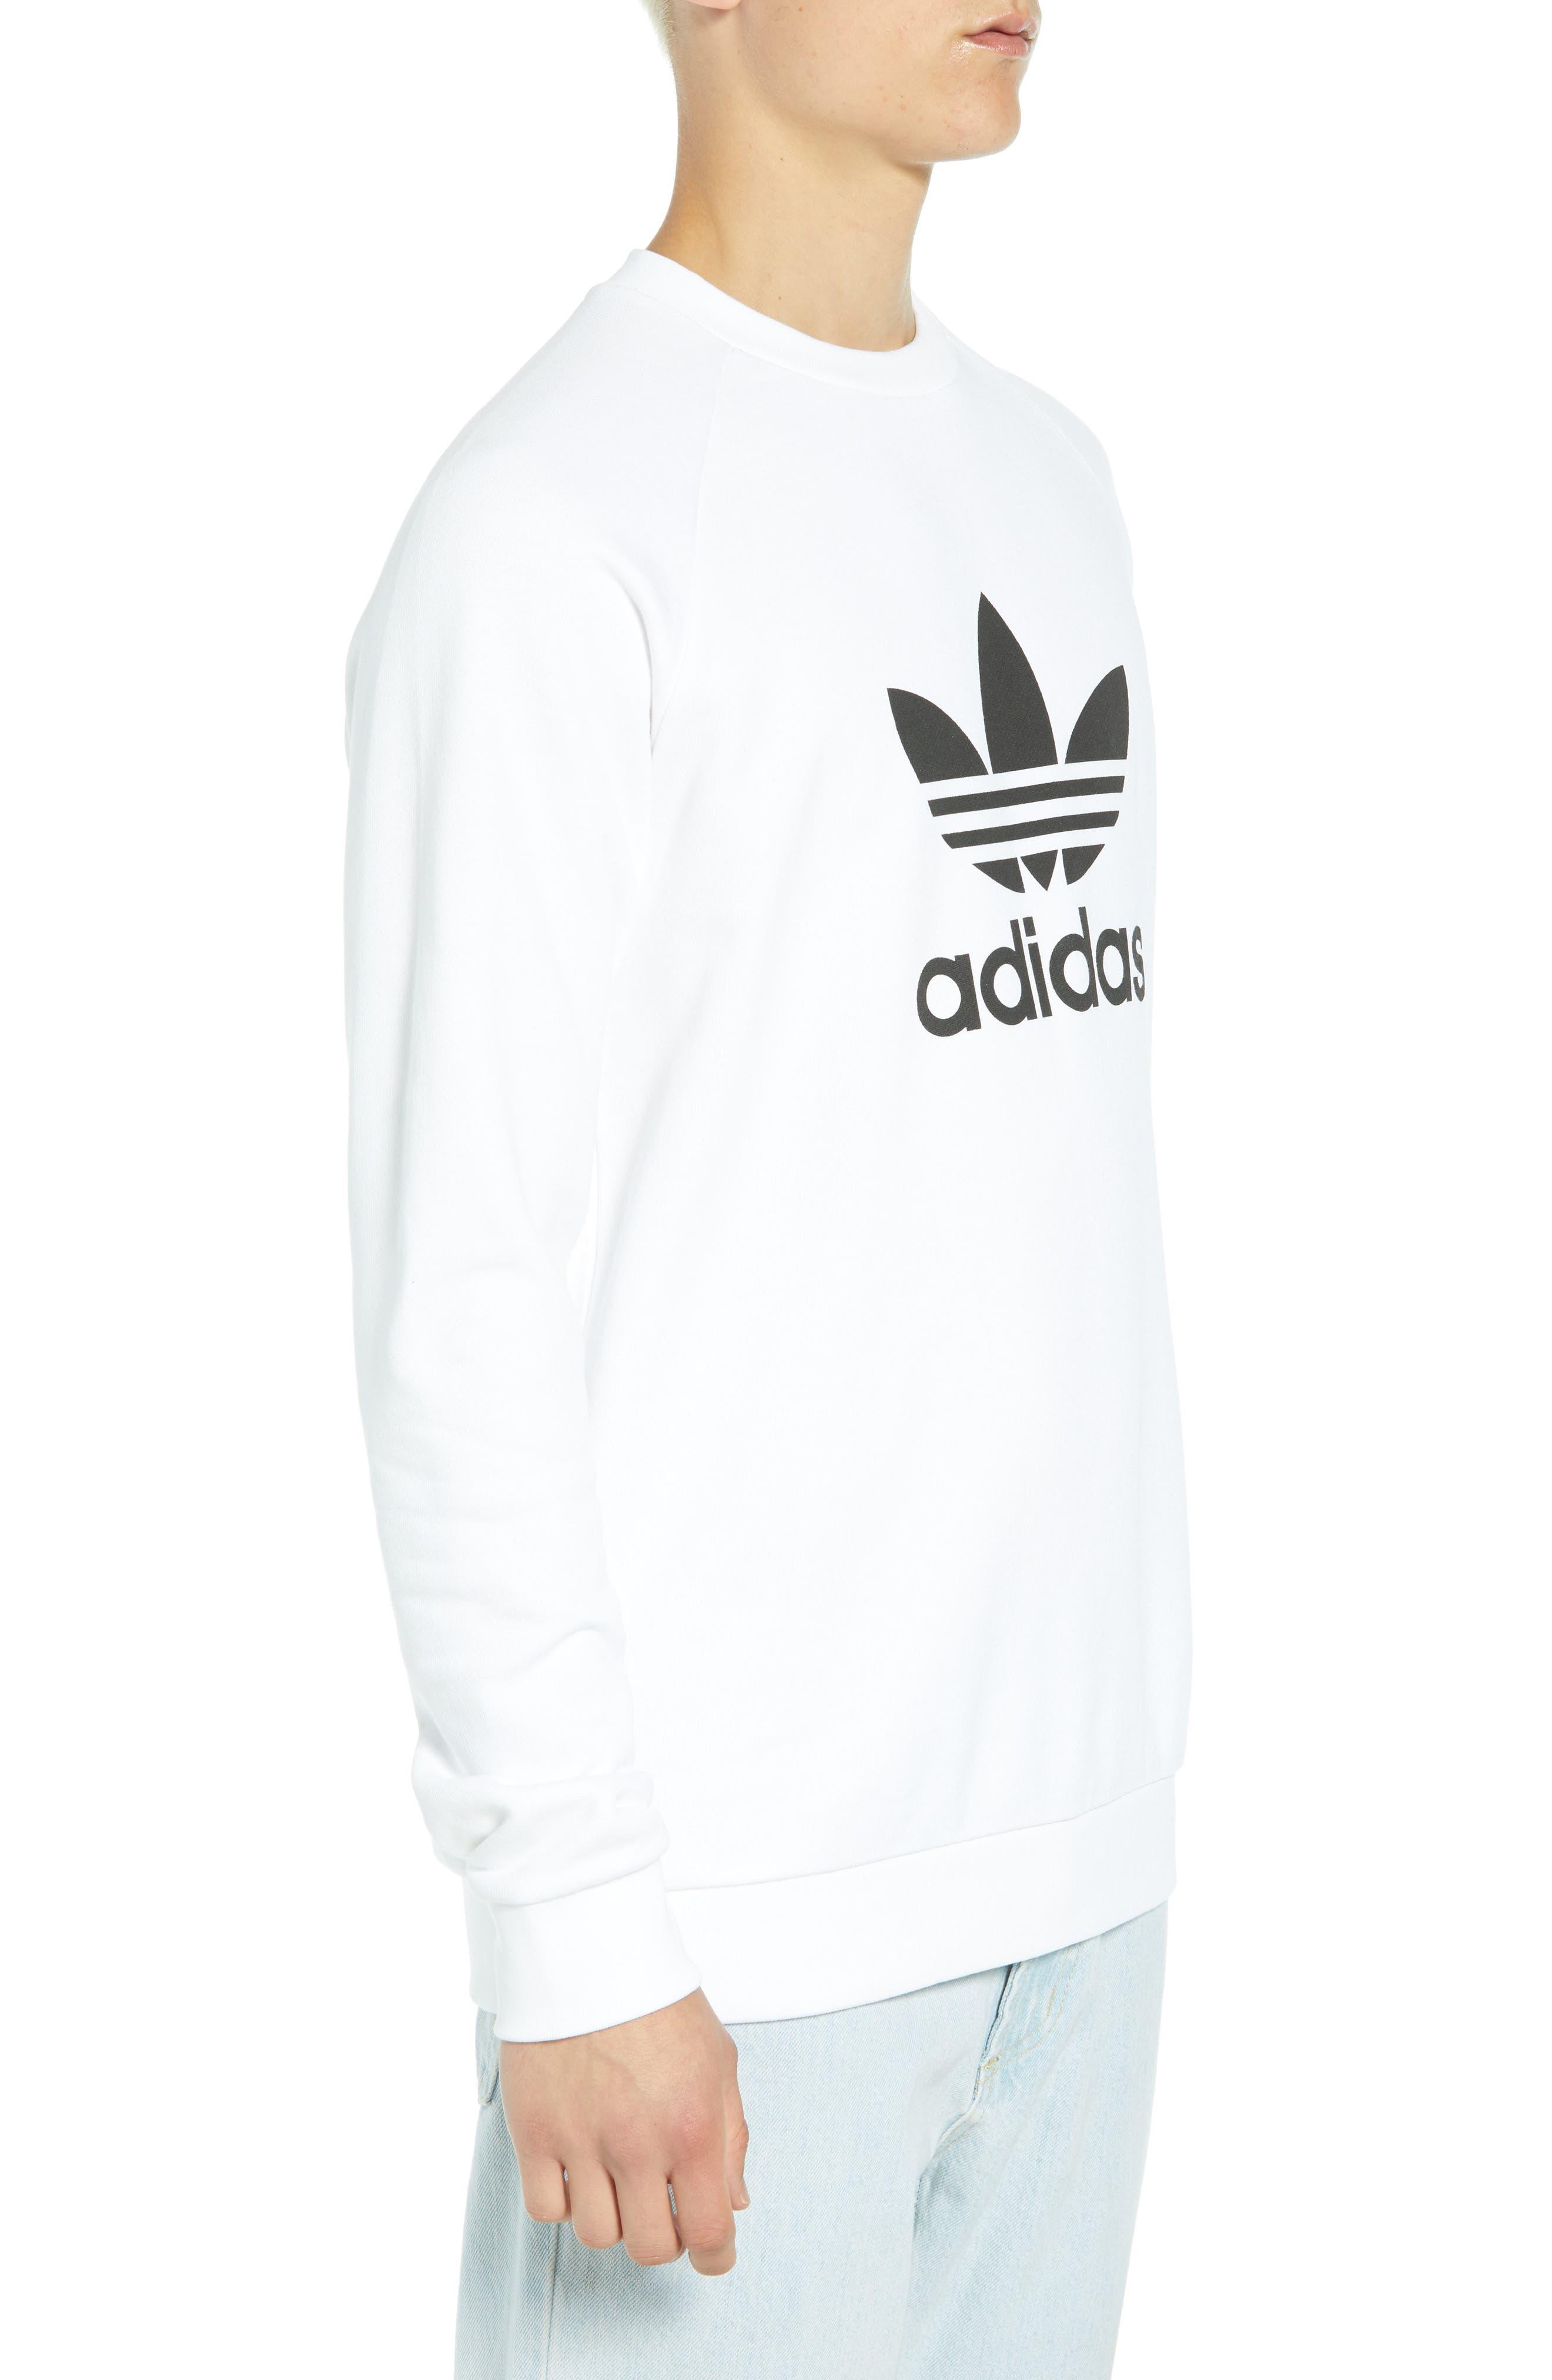 ADIDAS ORIGINALS, Trefoil Sweatshirt, Alternate thumbnail 3, color, WHITE